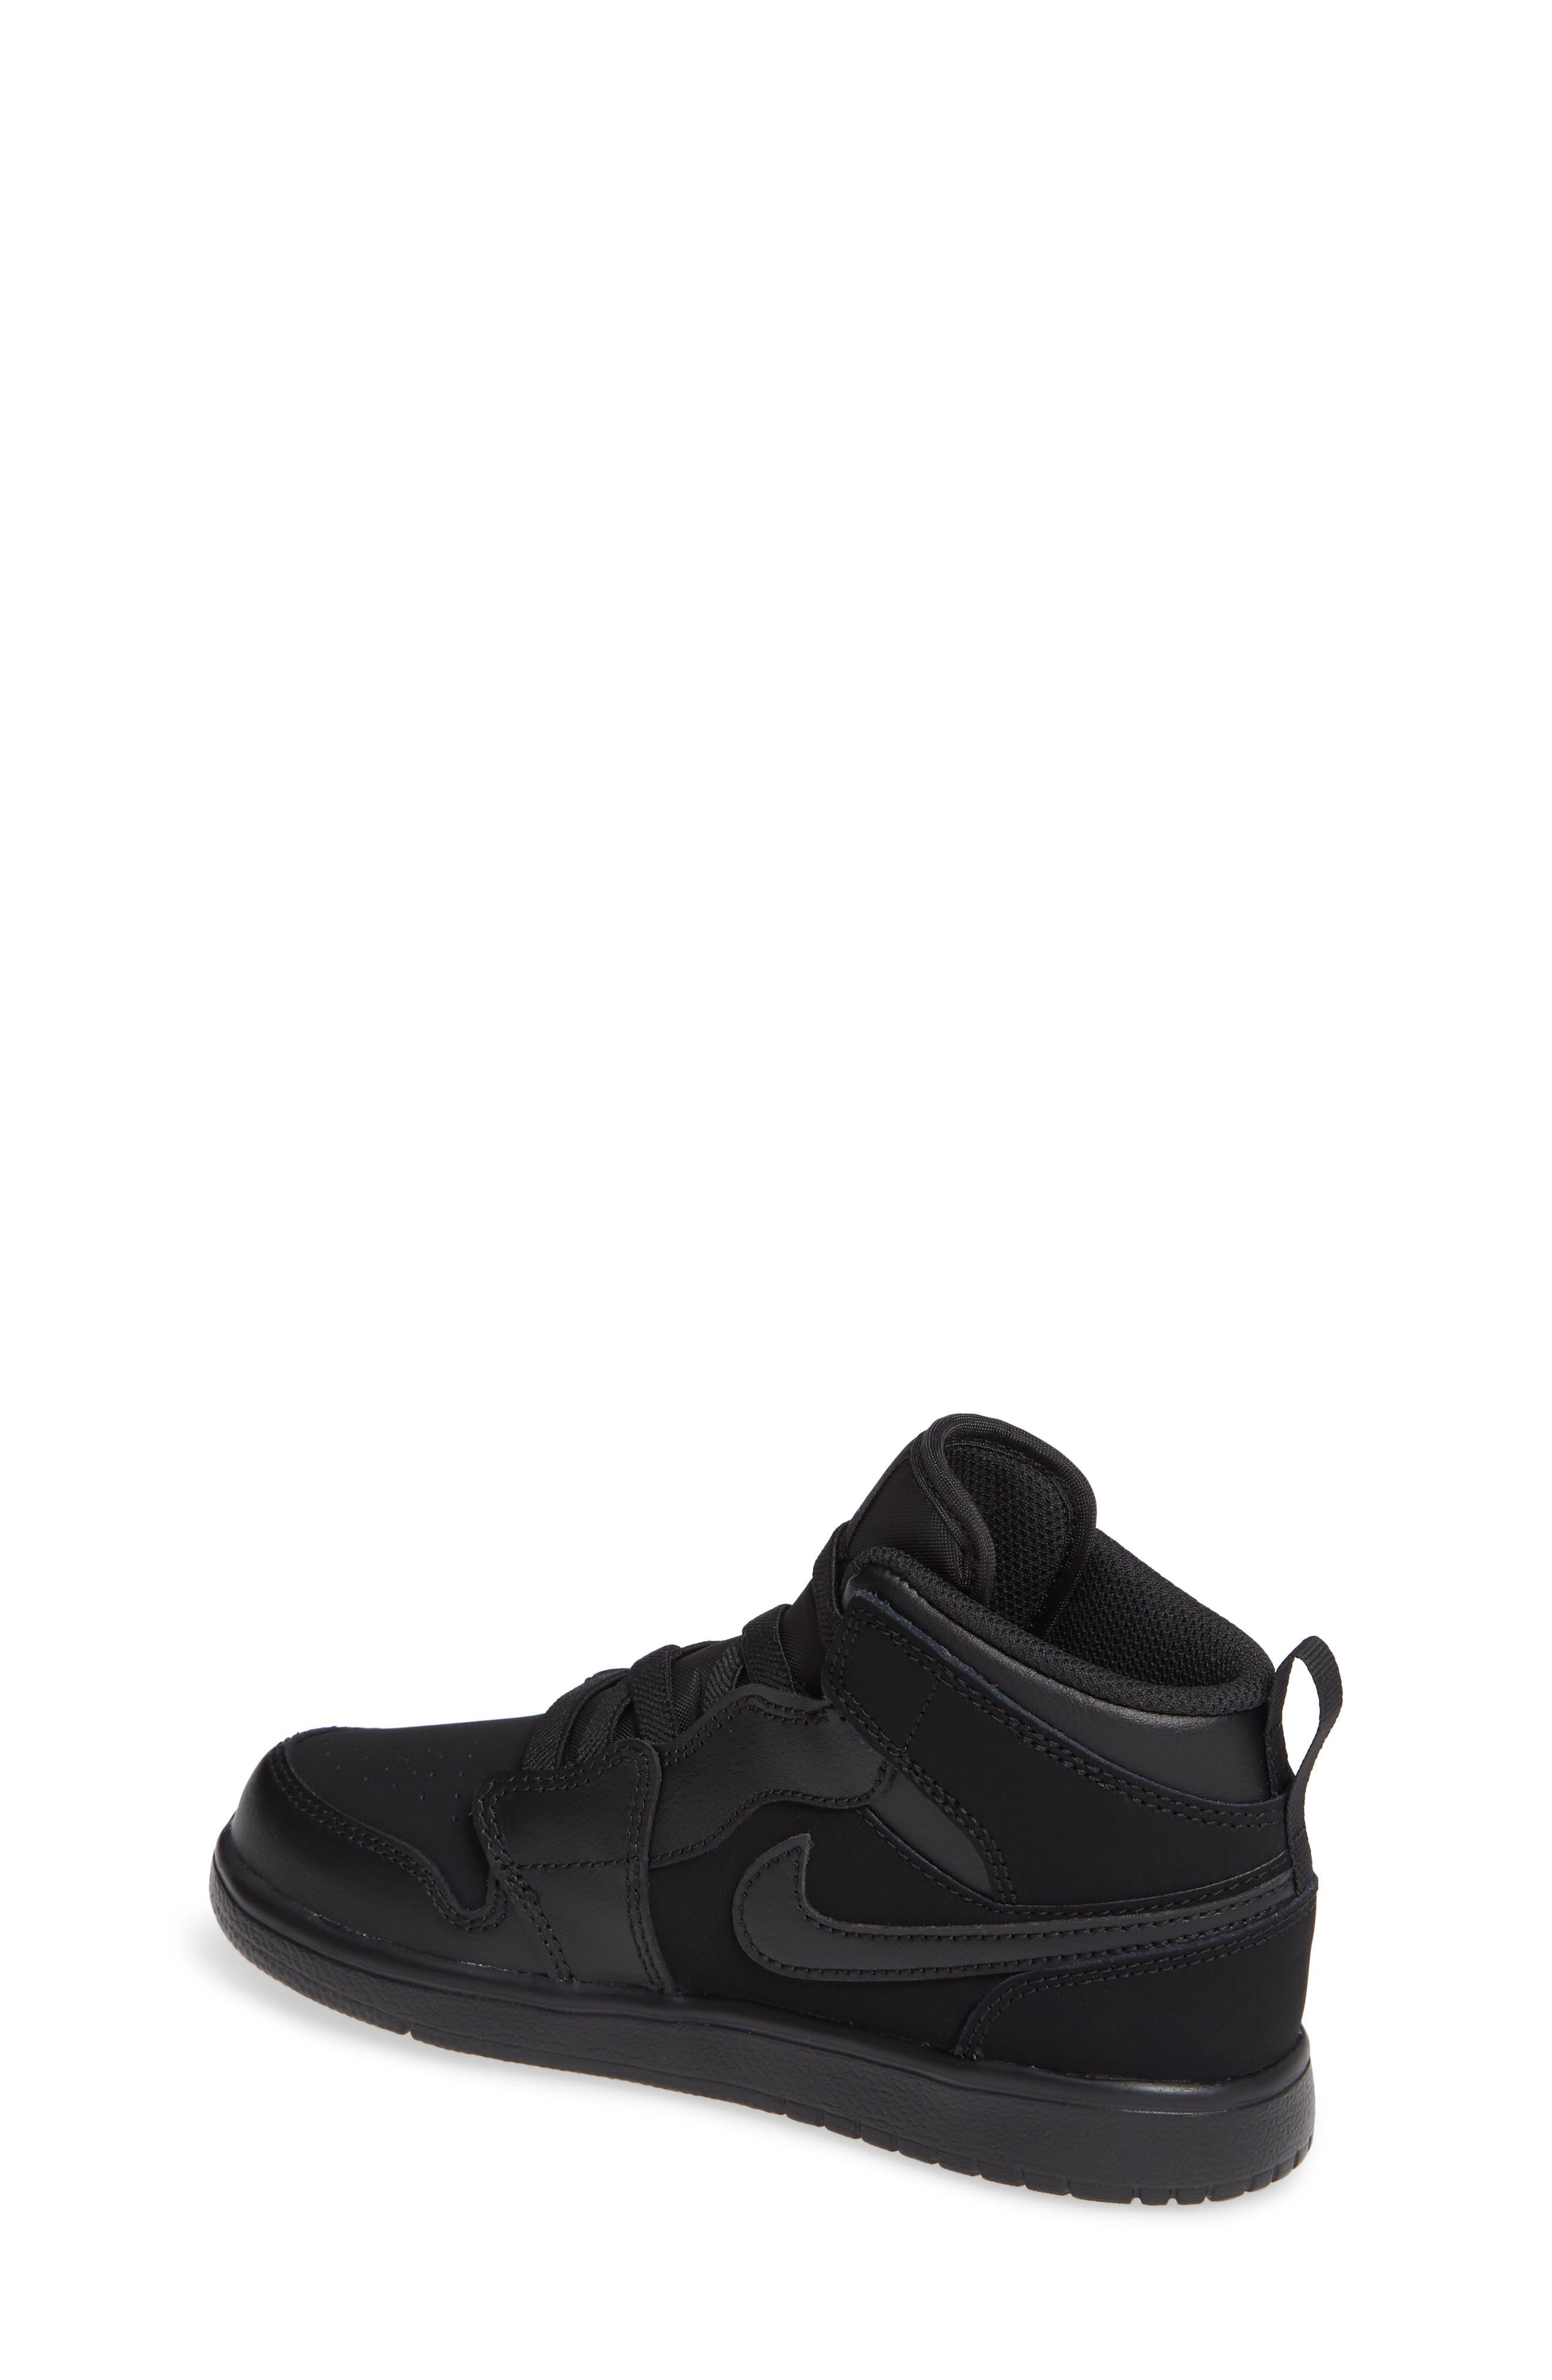 JORDAN, 1 Mid Basketball Shoe, Alternate thumbnail 2, color, BLACK/ DARK GREY